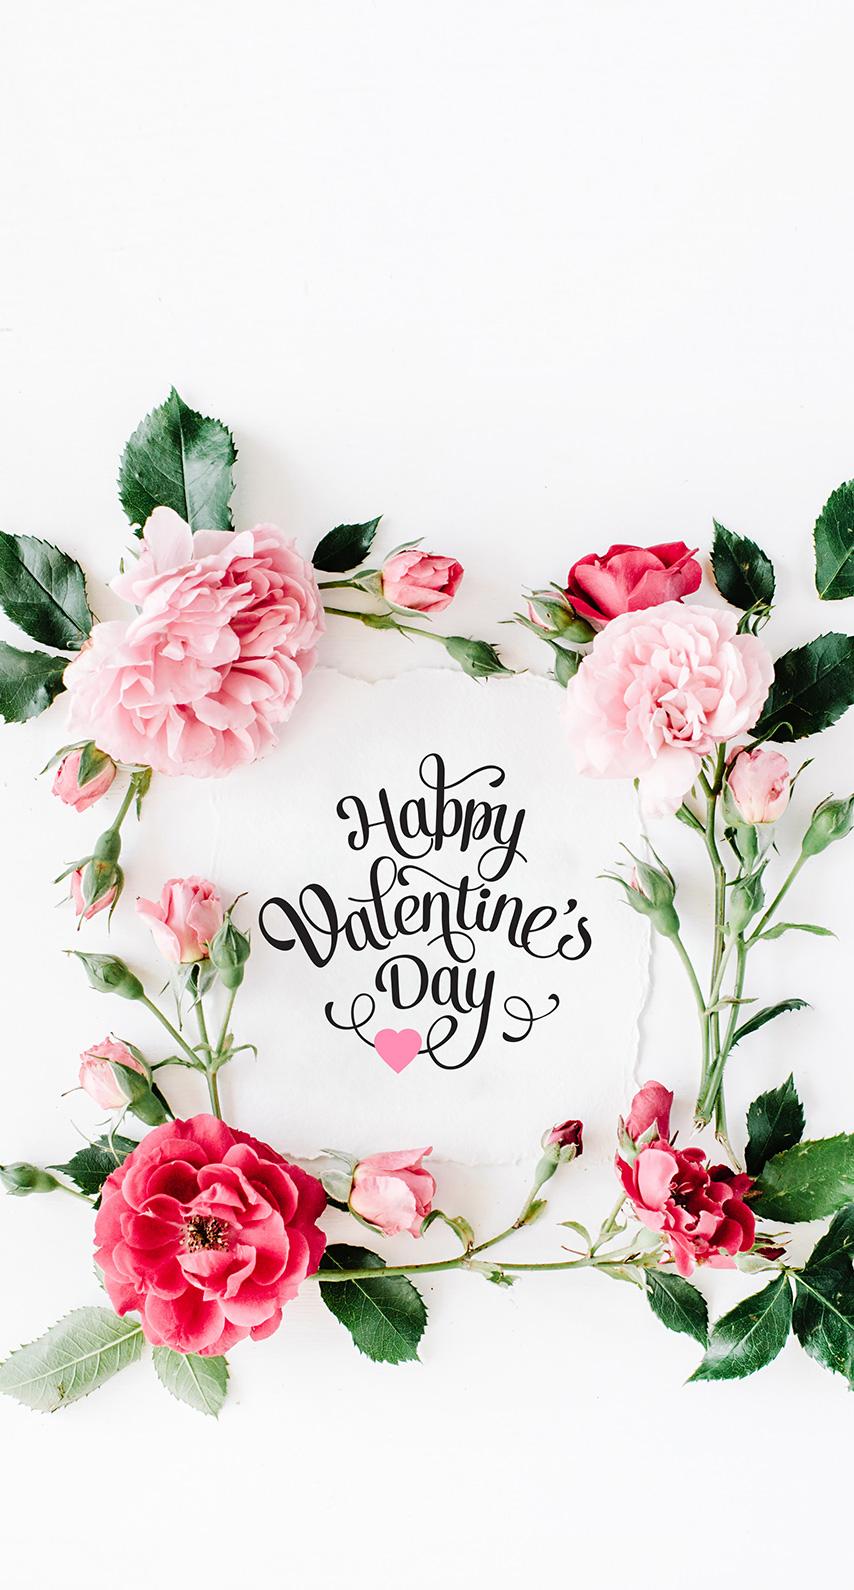 rose family, floristry